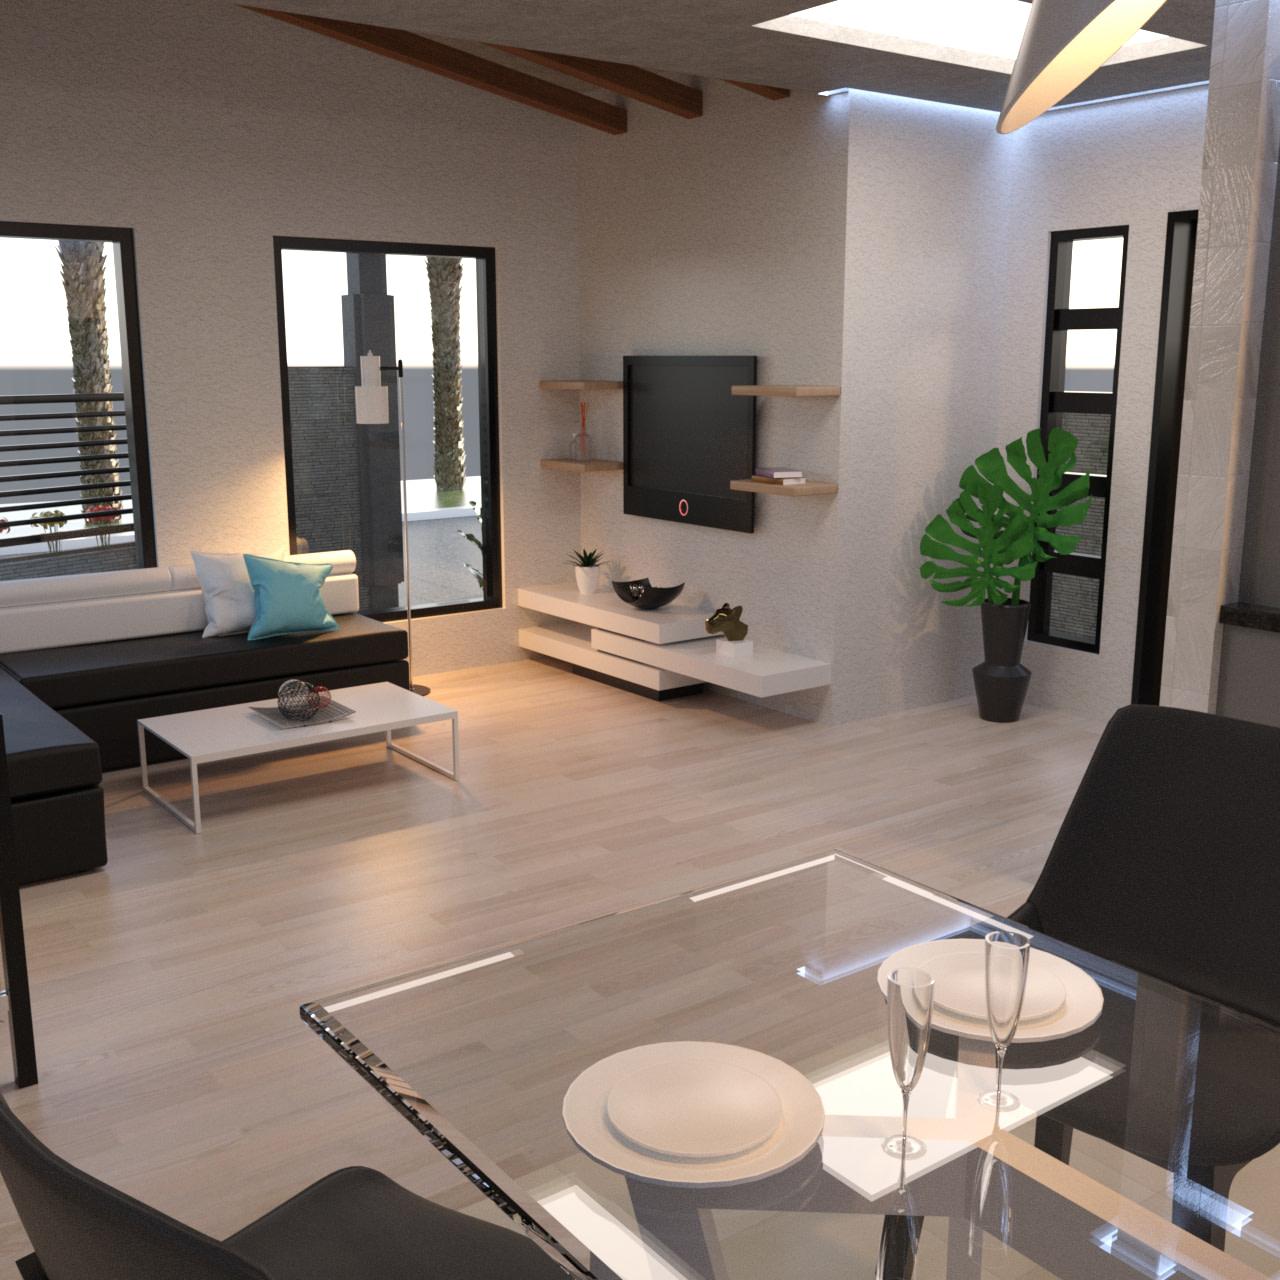 Interior of the corner lot house 3d model